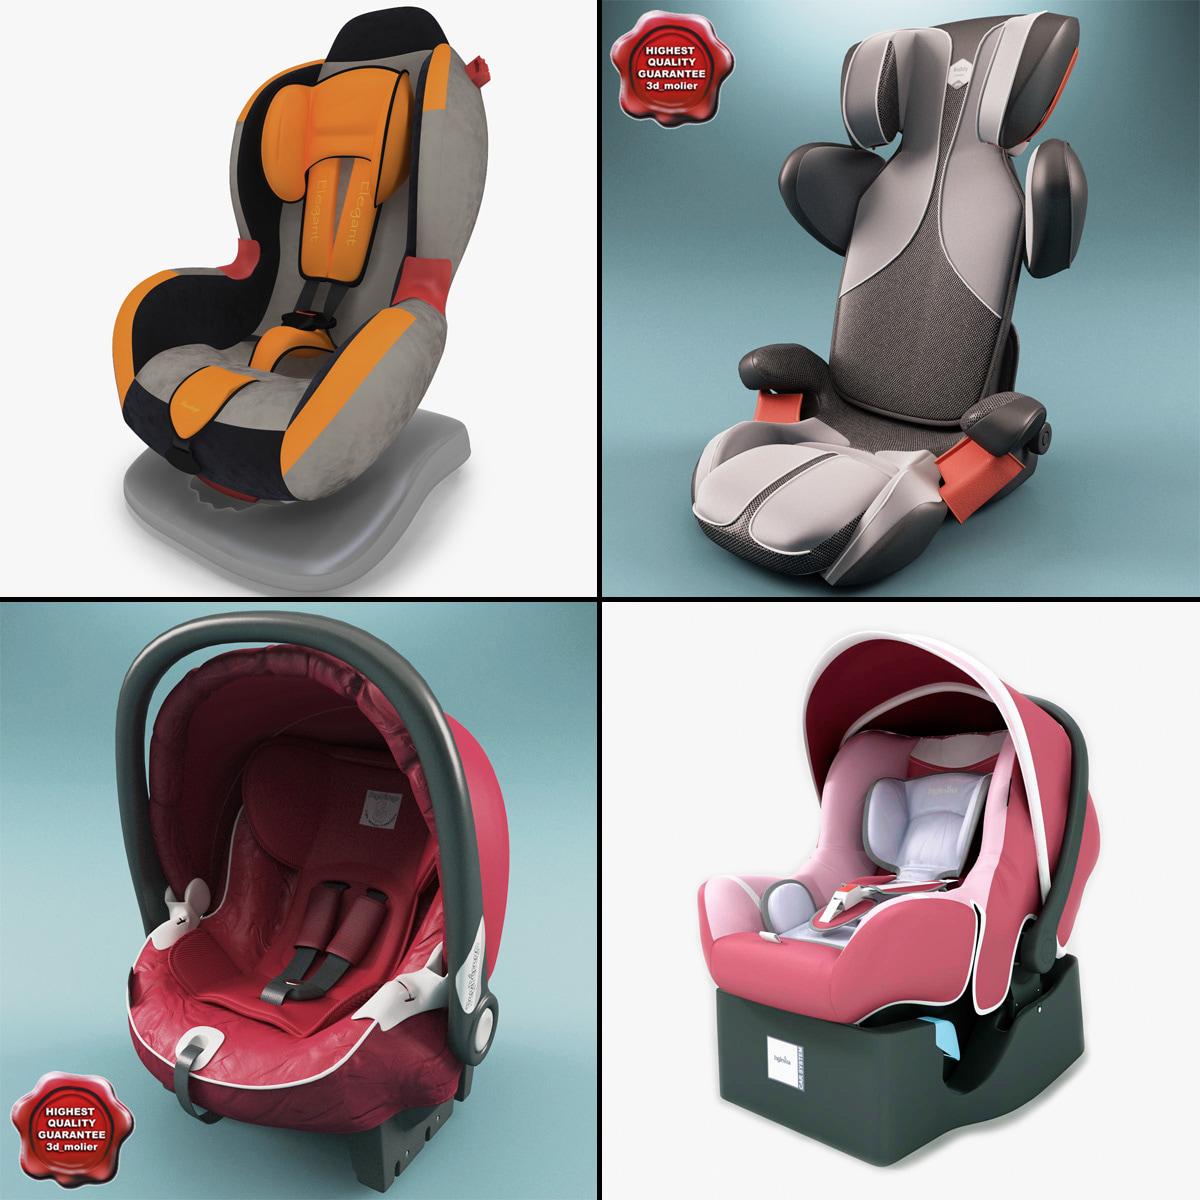 Kiddy_Car_Seats_Collection_V3_000.jpg